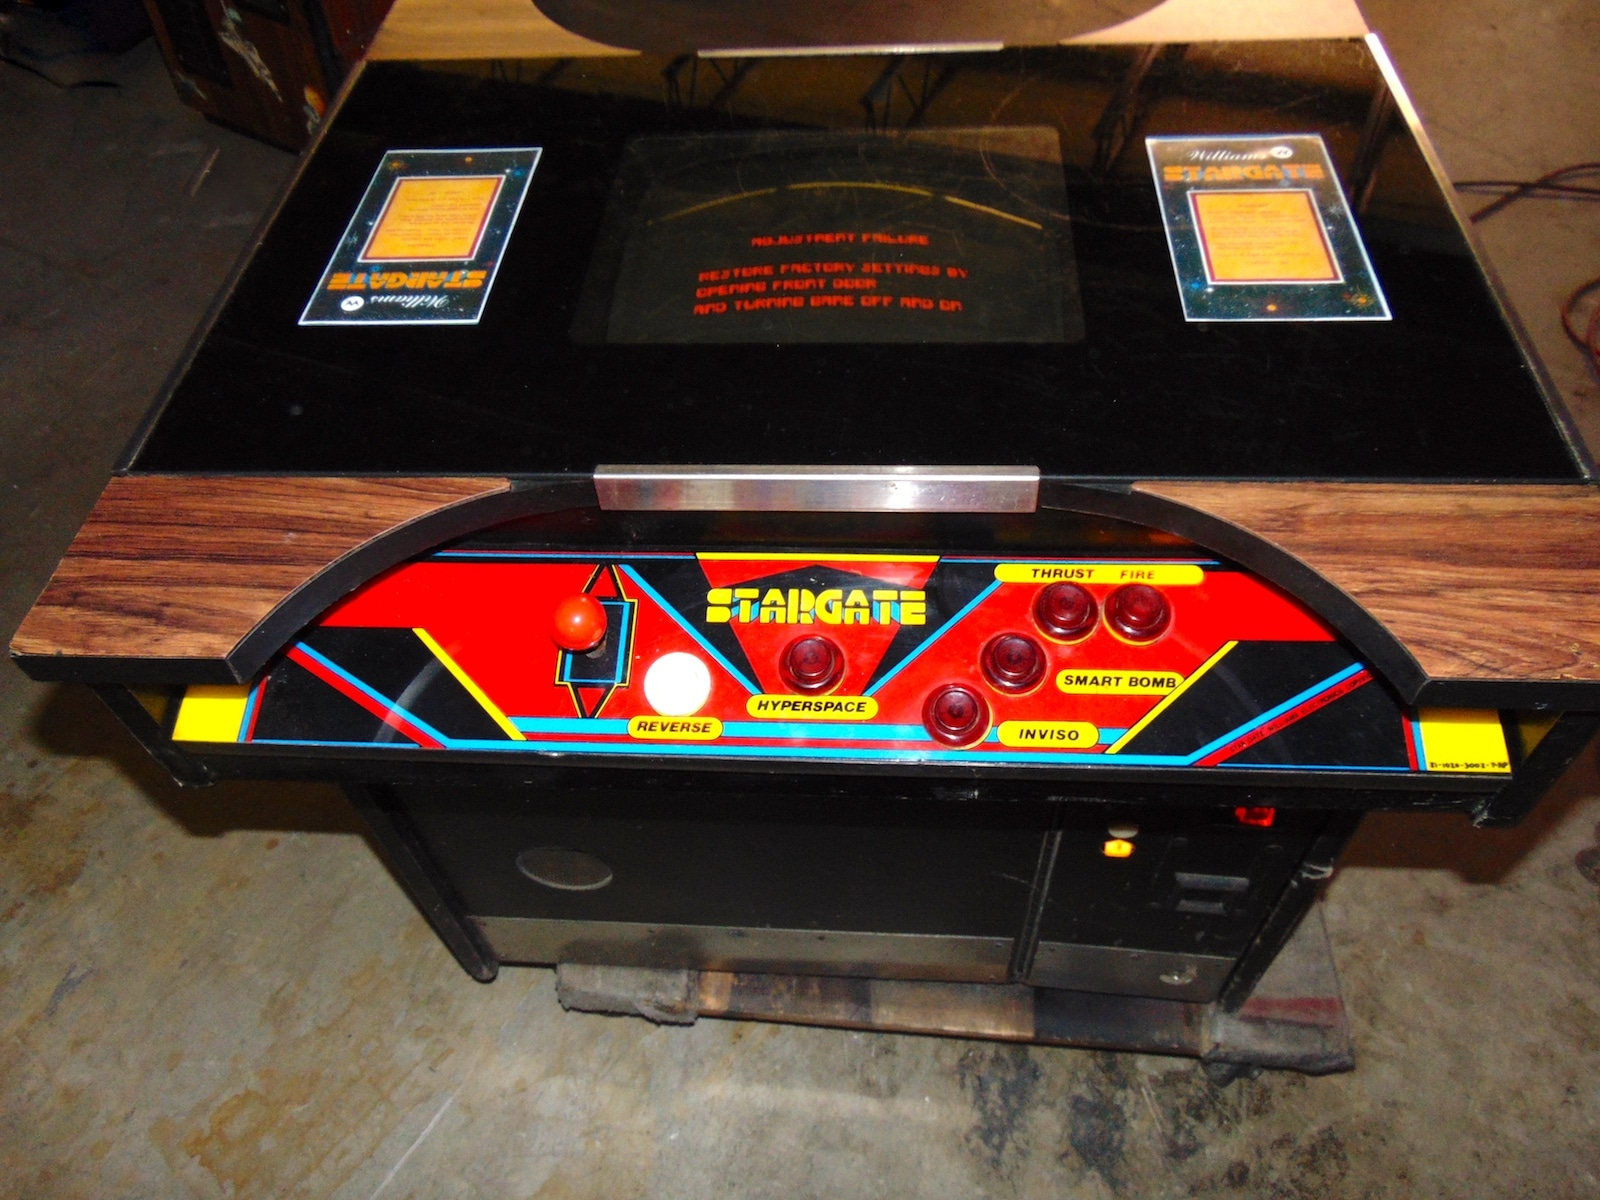 Star Gate Cocktail Arcade Game